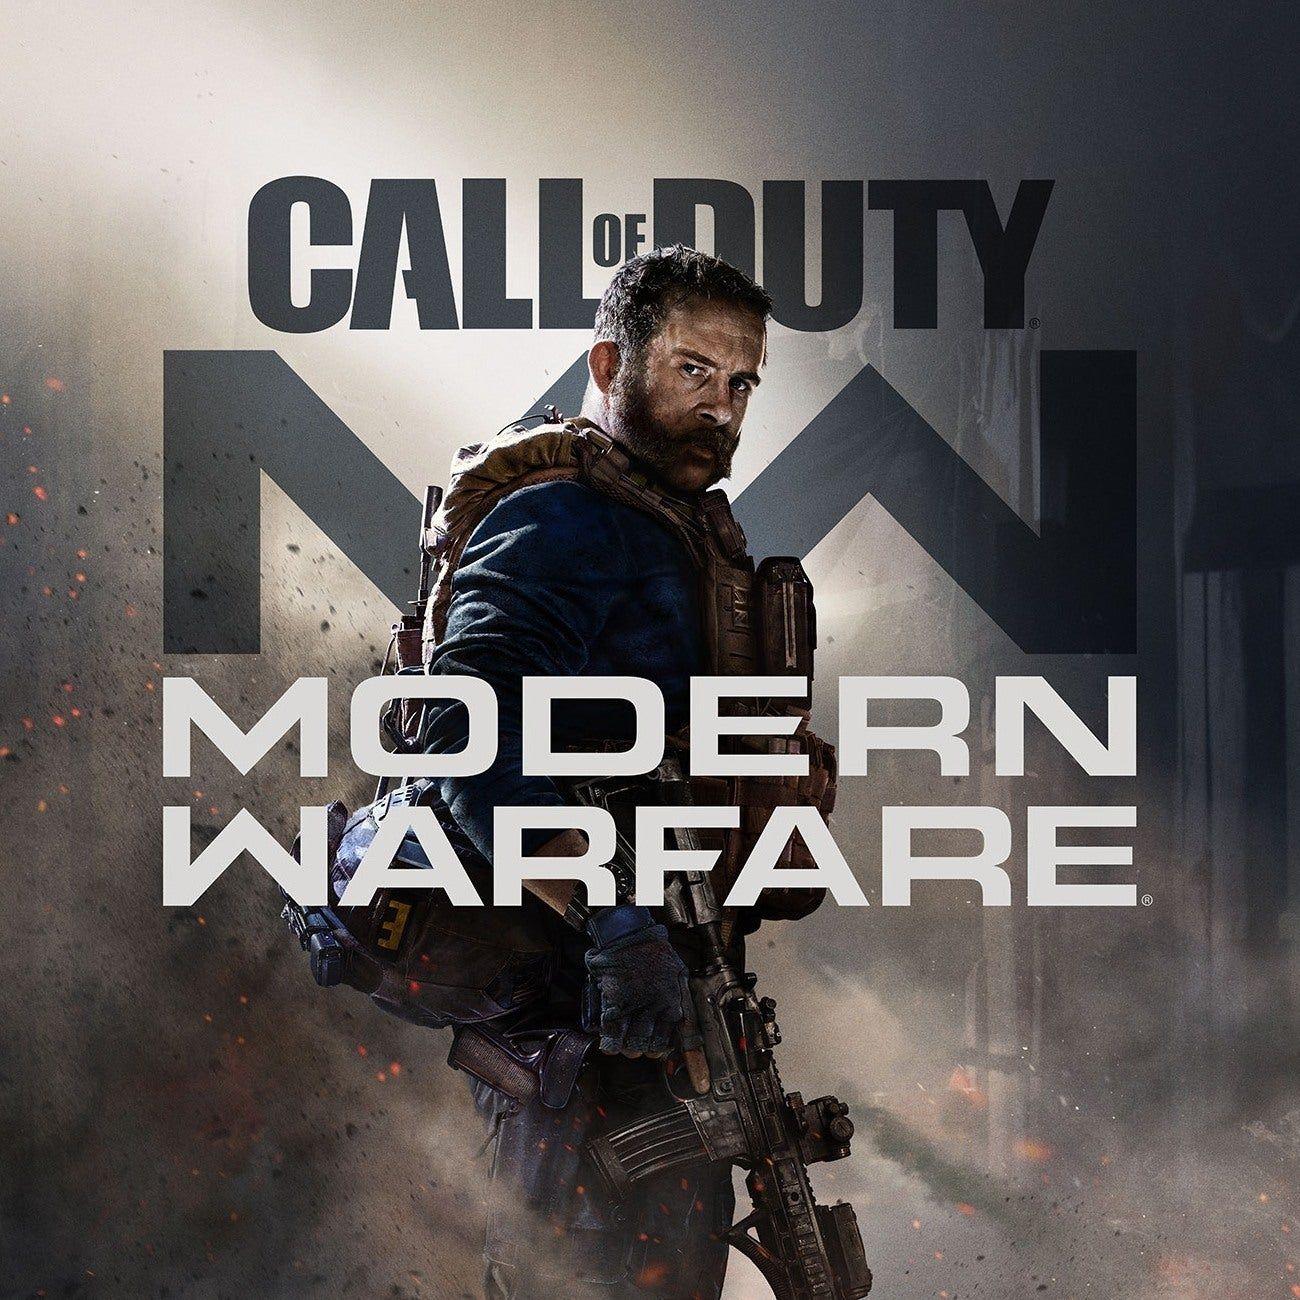 Call of duty modern warefare (xbox one) - £36 via US Microsoft Store